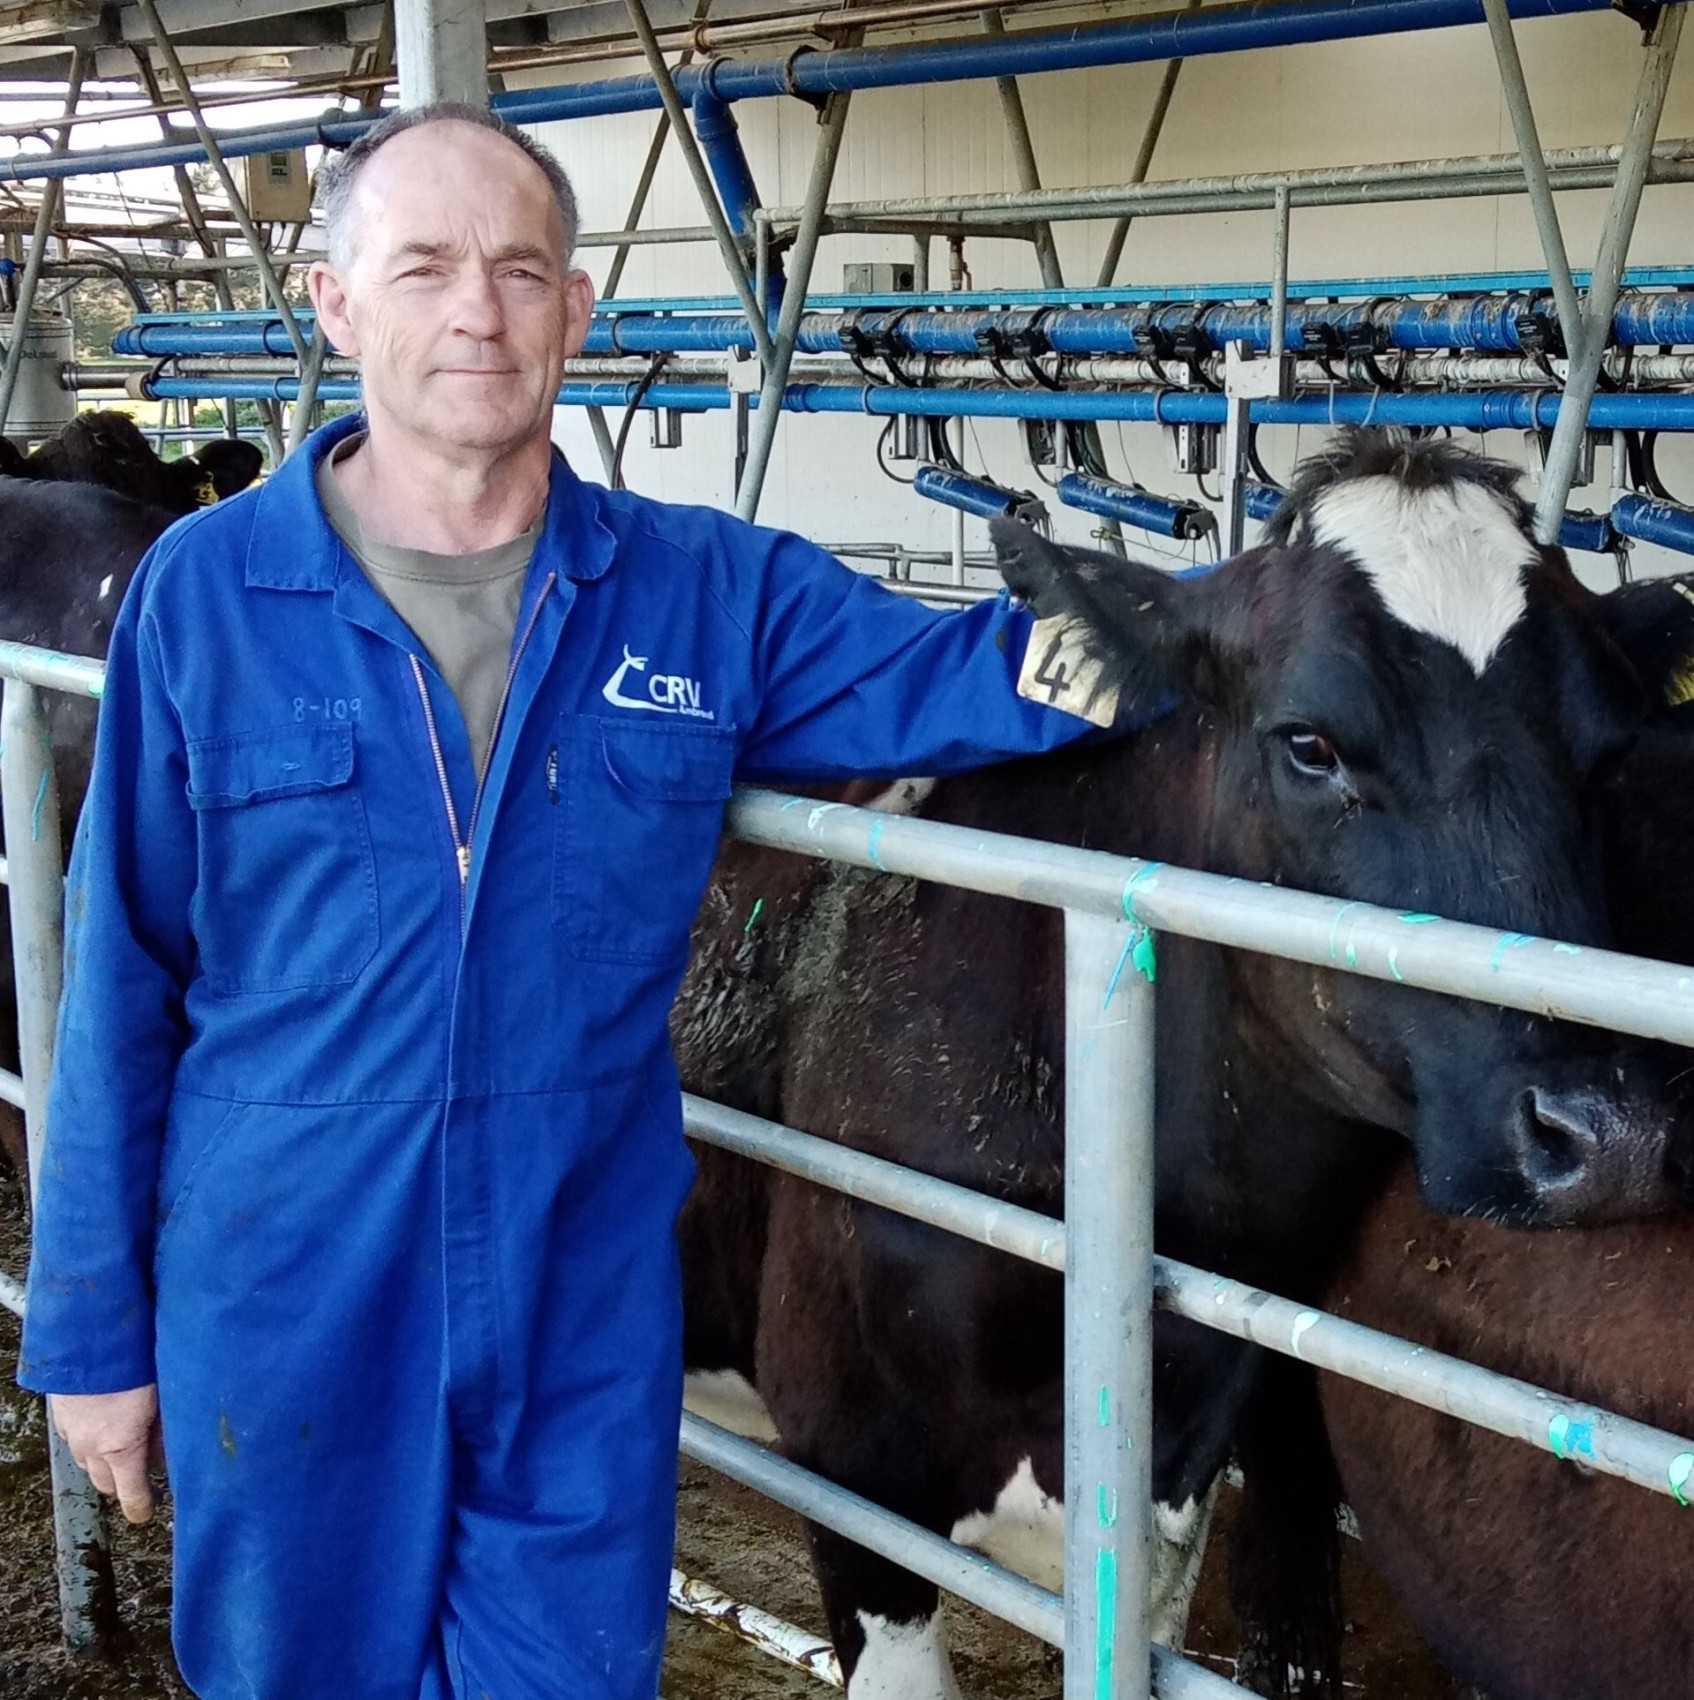 Artificial Breeding (AB) technician Dirk van den Ven